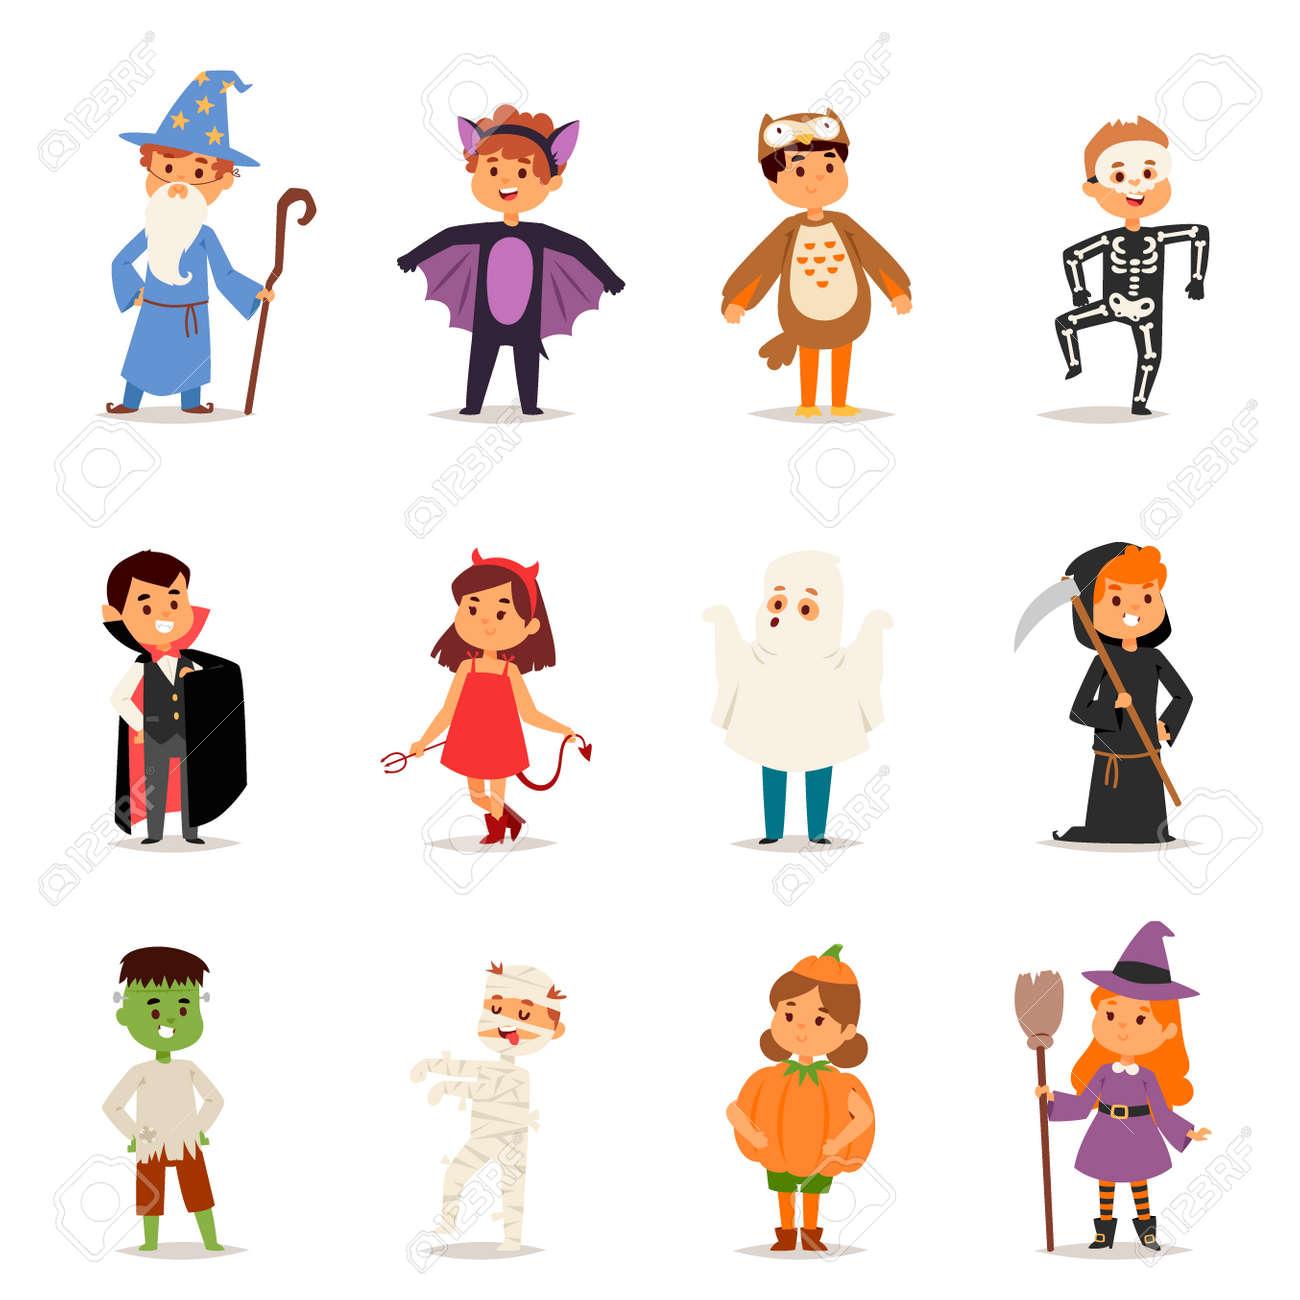 Cute kids wearing Halloween party costumes vector. - 88108349